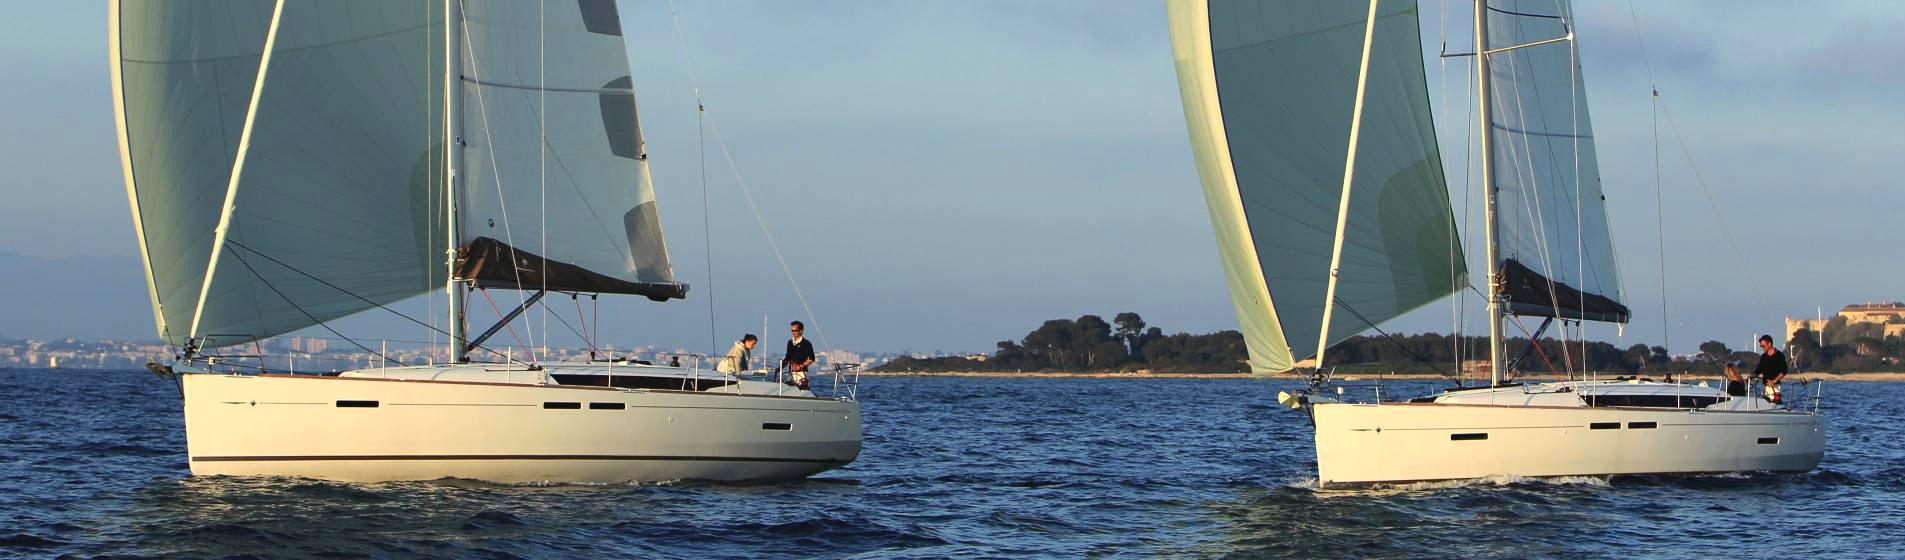 Voilier Jeanneau Sun Odyssee 449, voilier à Marseille, Yacht Méditerranée.